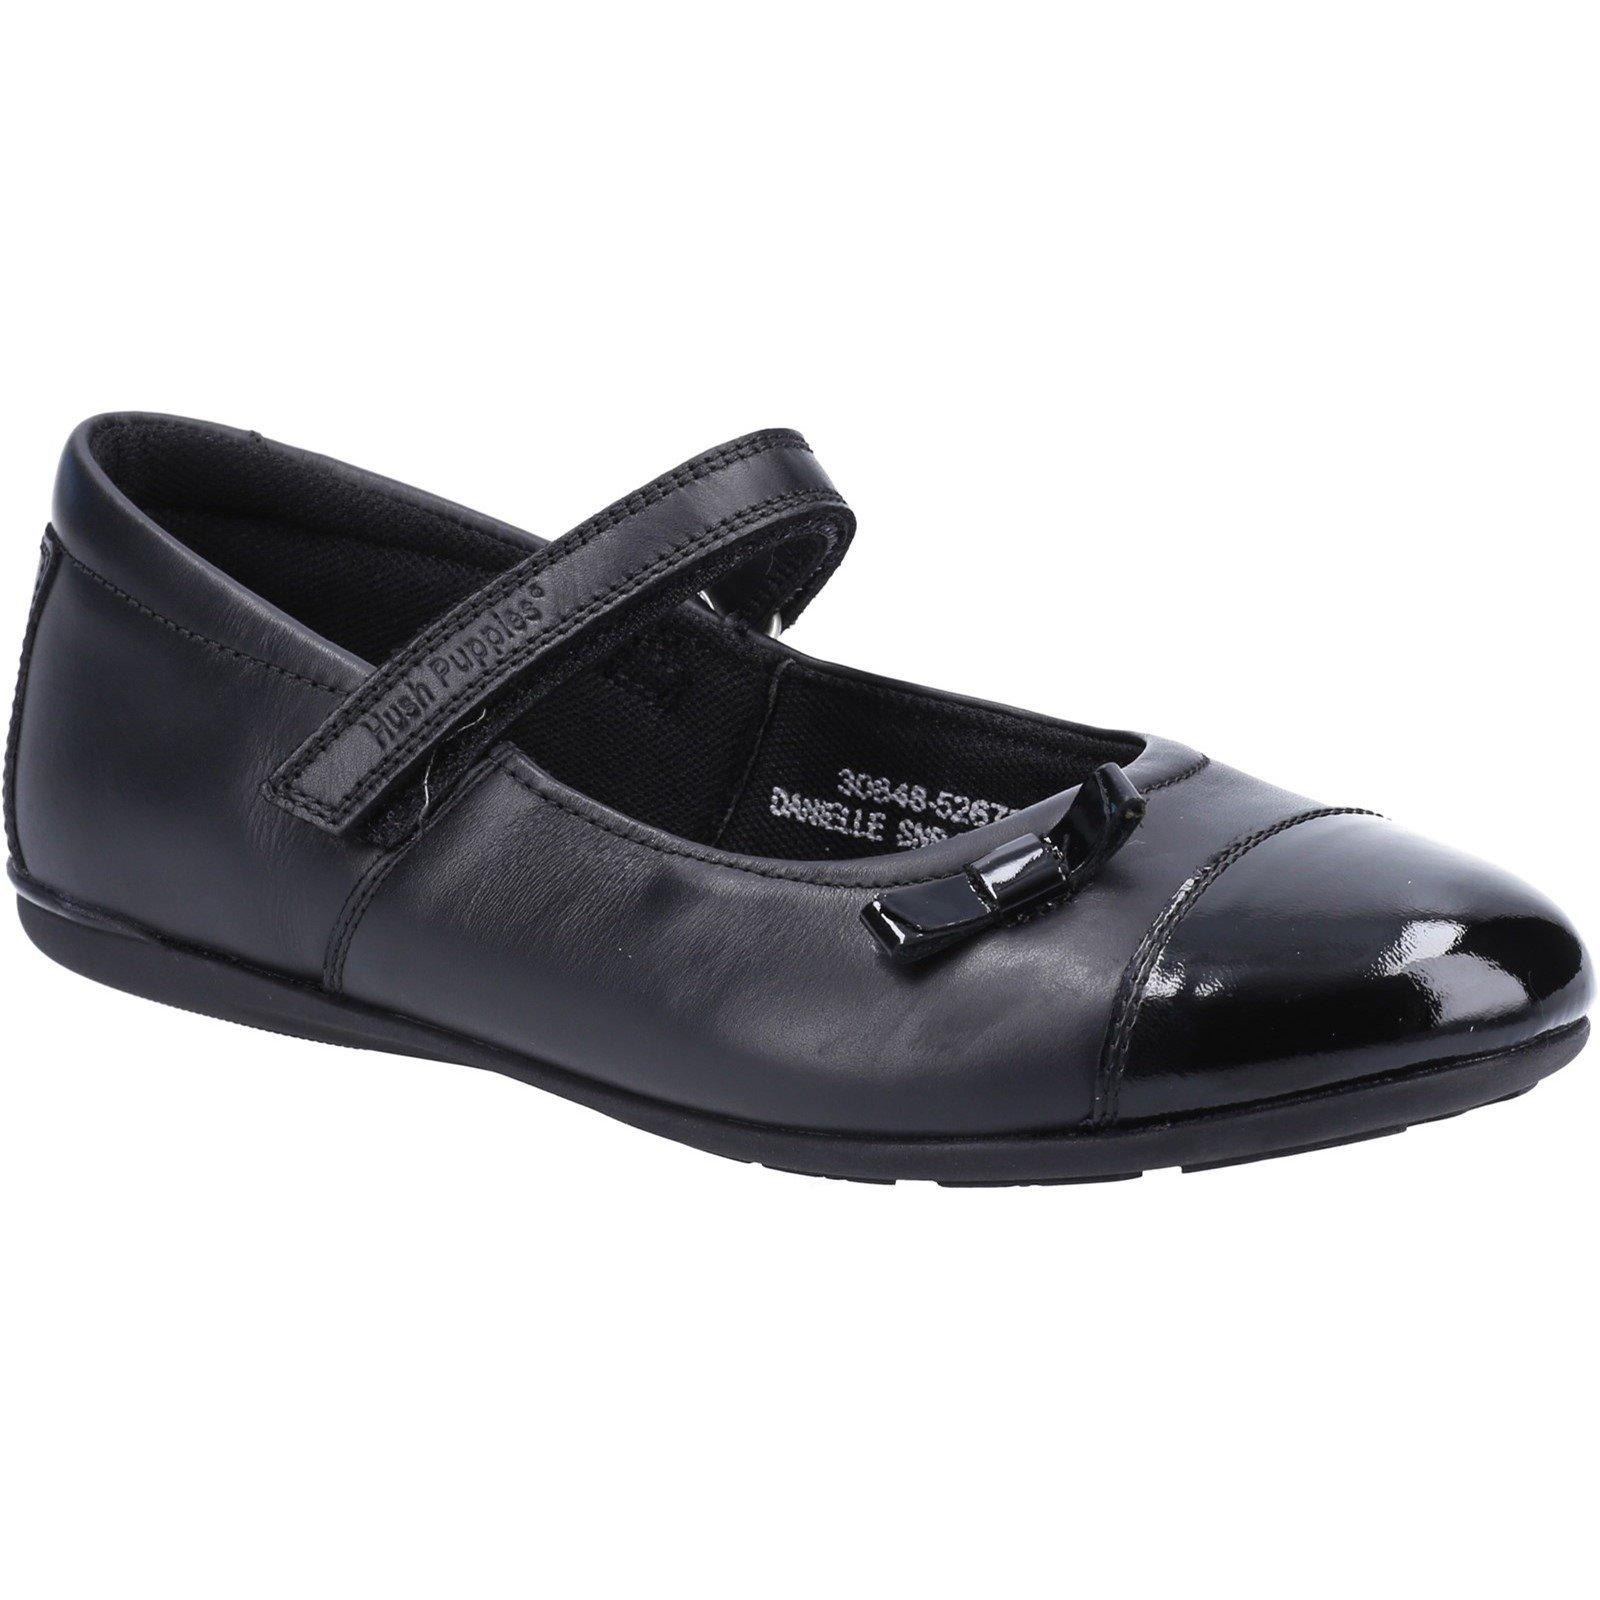 Hush Puppies Kid's Danielle Junior School Shoe Black 30847 - Black 11